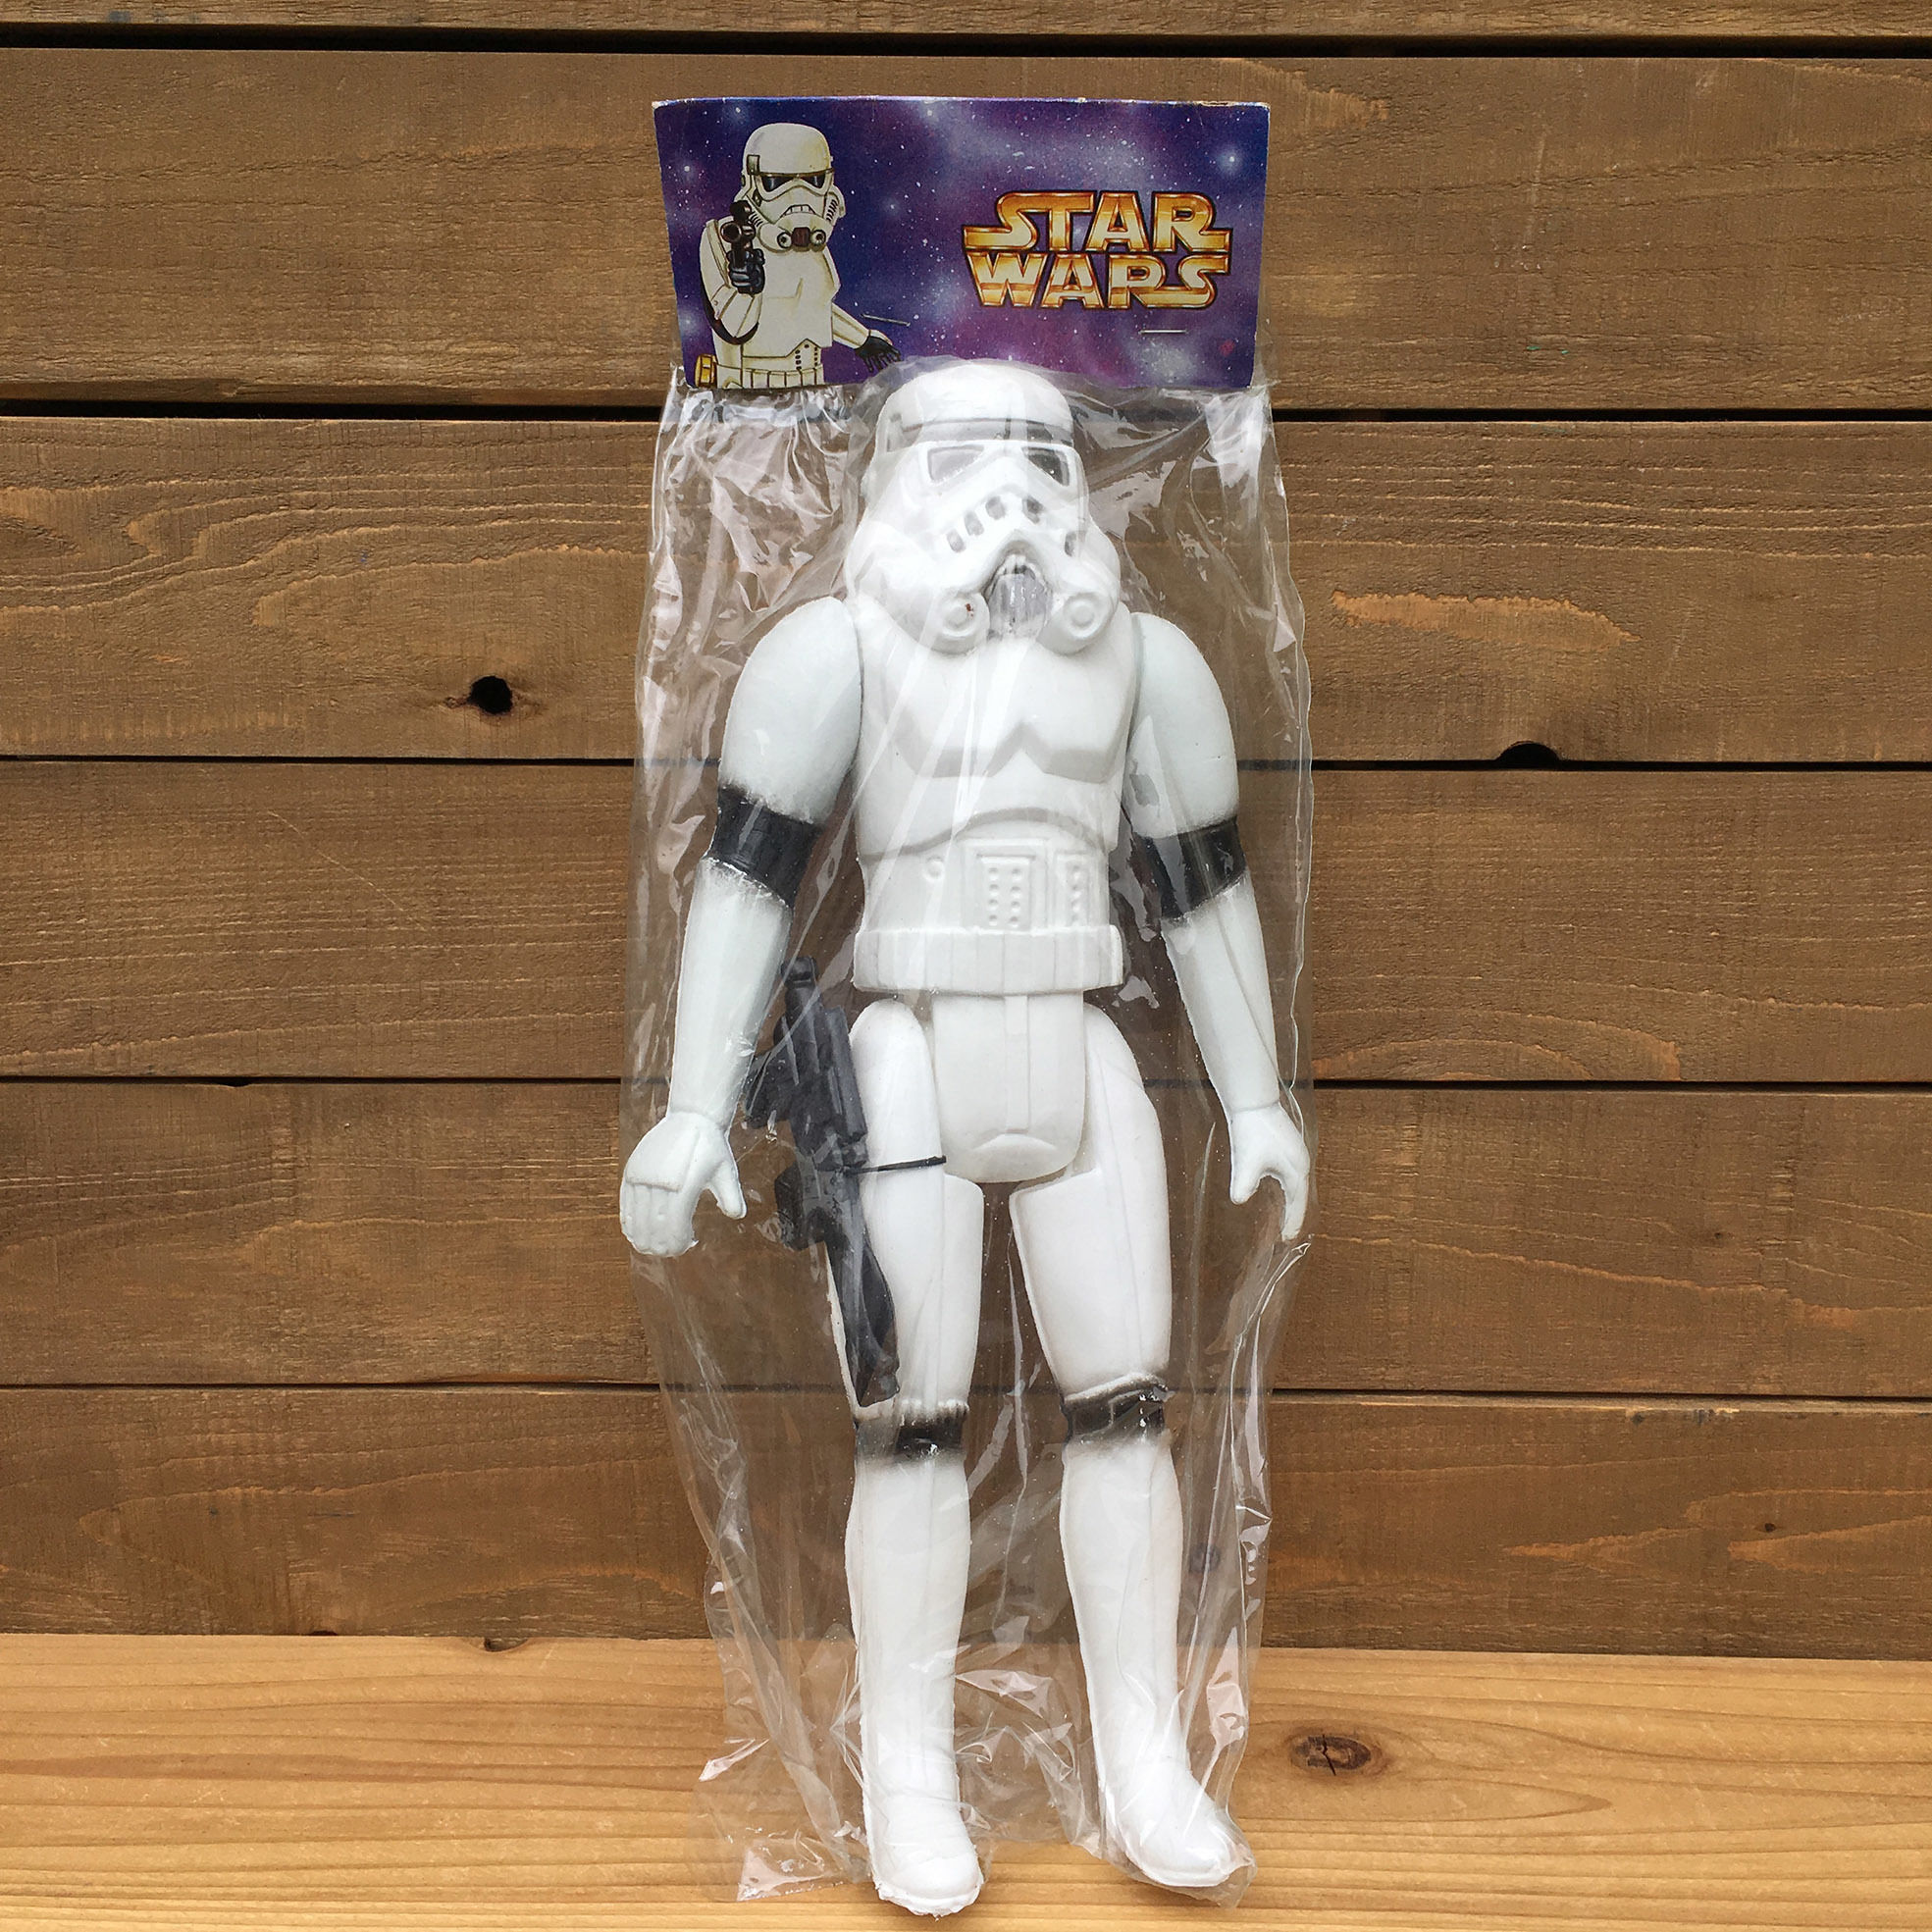 STARWARS Bootleg Giant Stormtrooper Figure/スターウォーズ ブートレグ ジャイアント ストームトルーパー フィギュア/170831-7